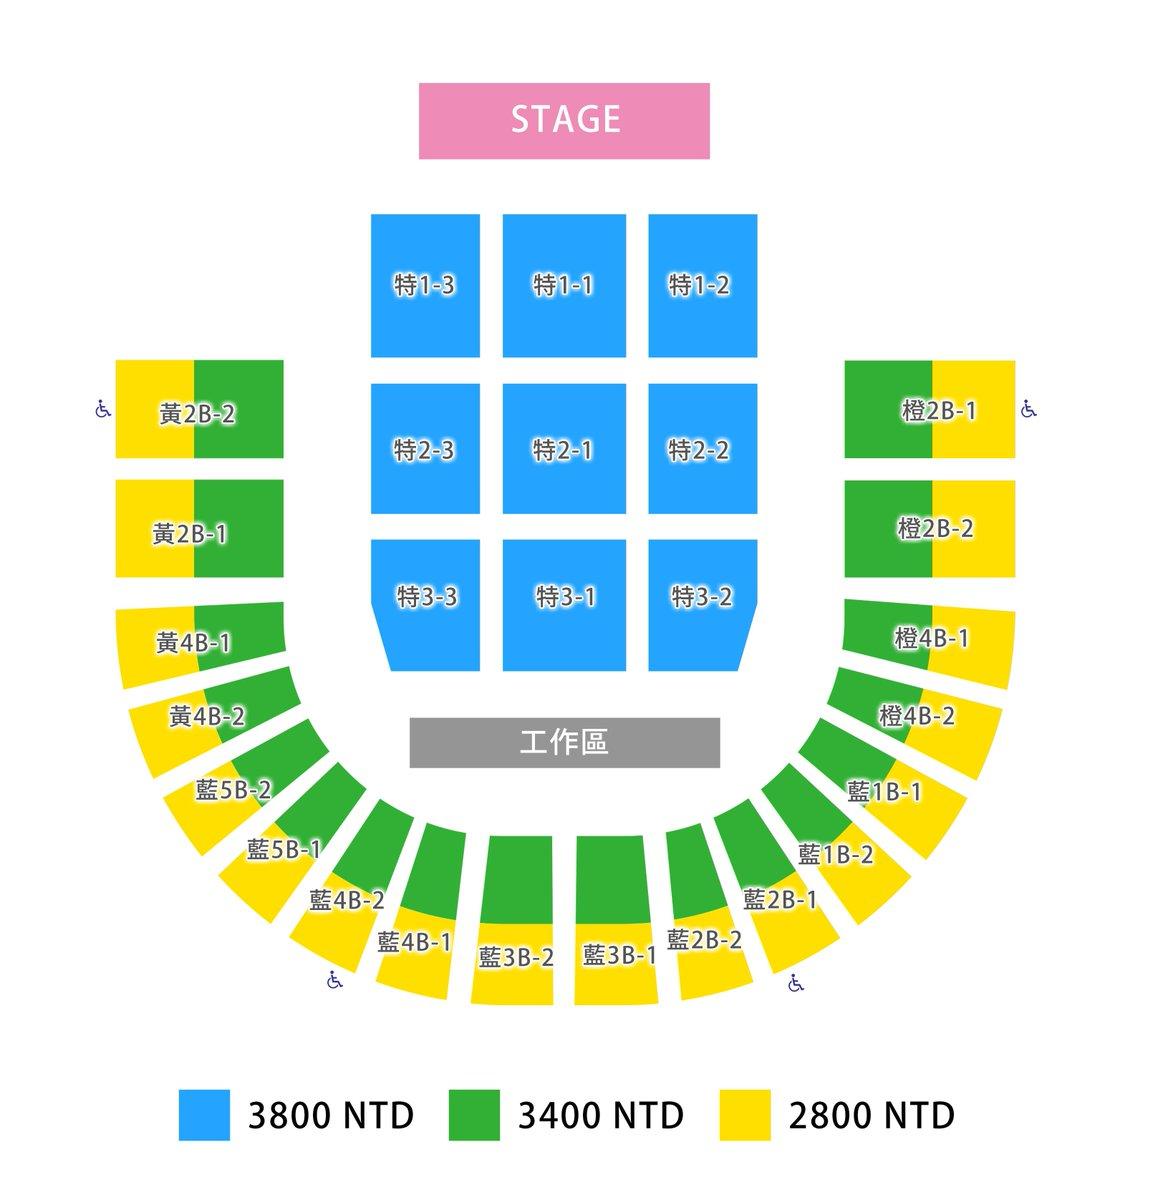 in 1 min green zone sold out in 2 mins yellow zone very limited seats left minna yaru ne nanamizuki mizukinana nmilpictwittercomni0amlgxin